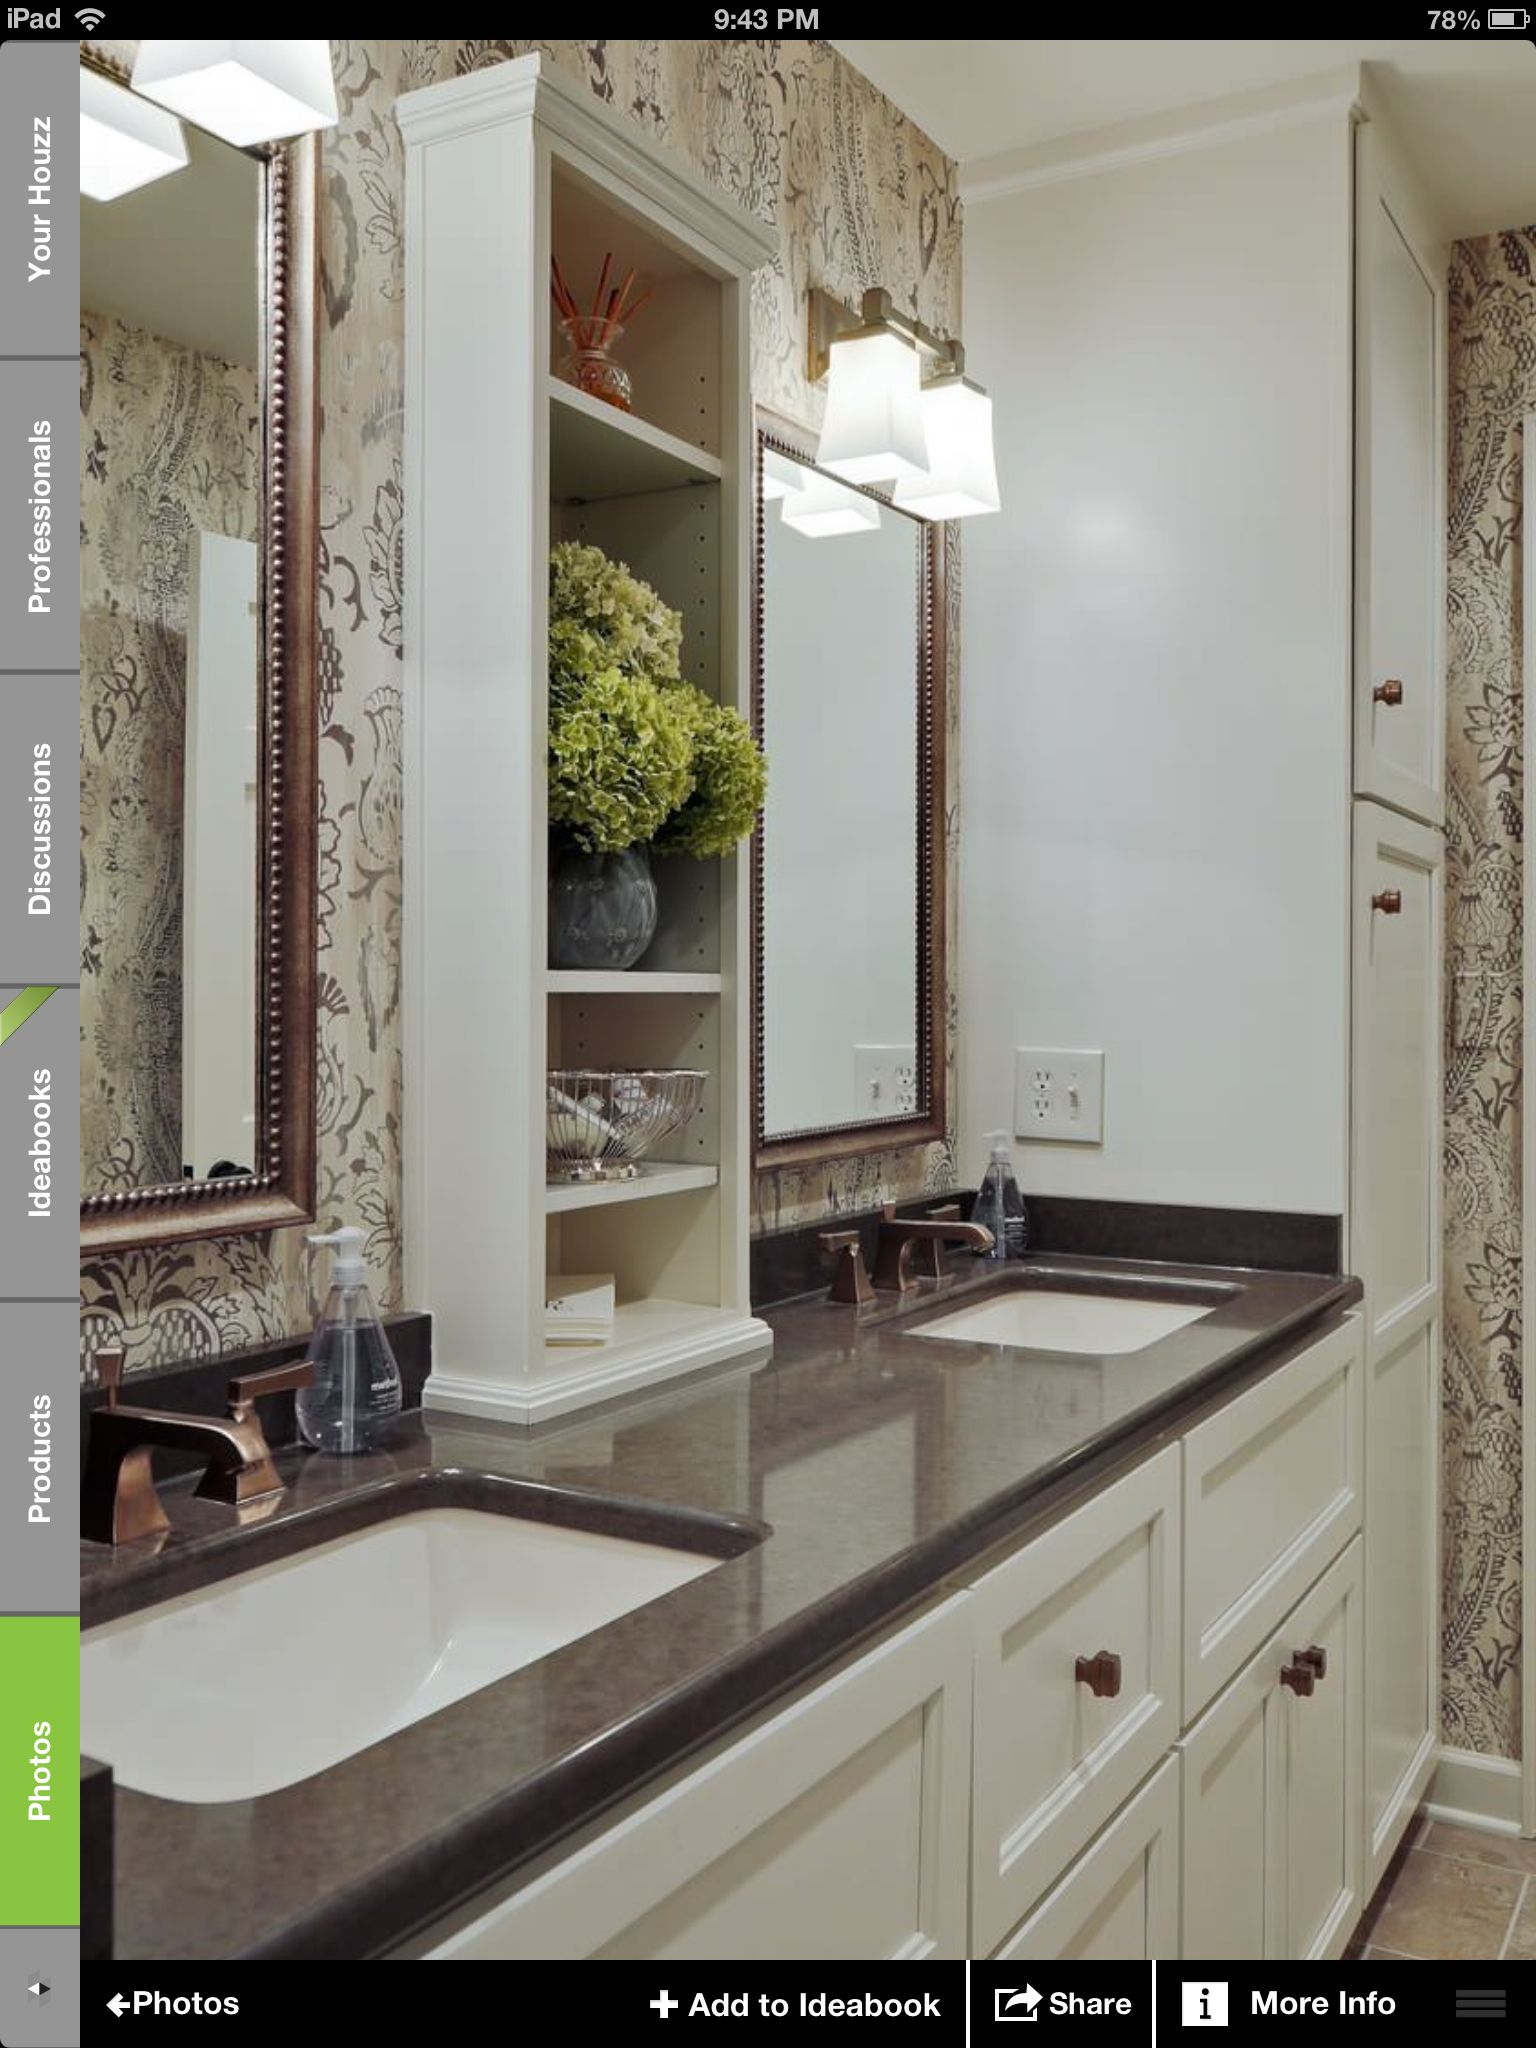 Vanity shelf to build 6x12x42 open back to mirror